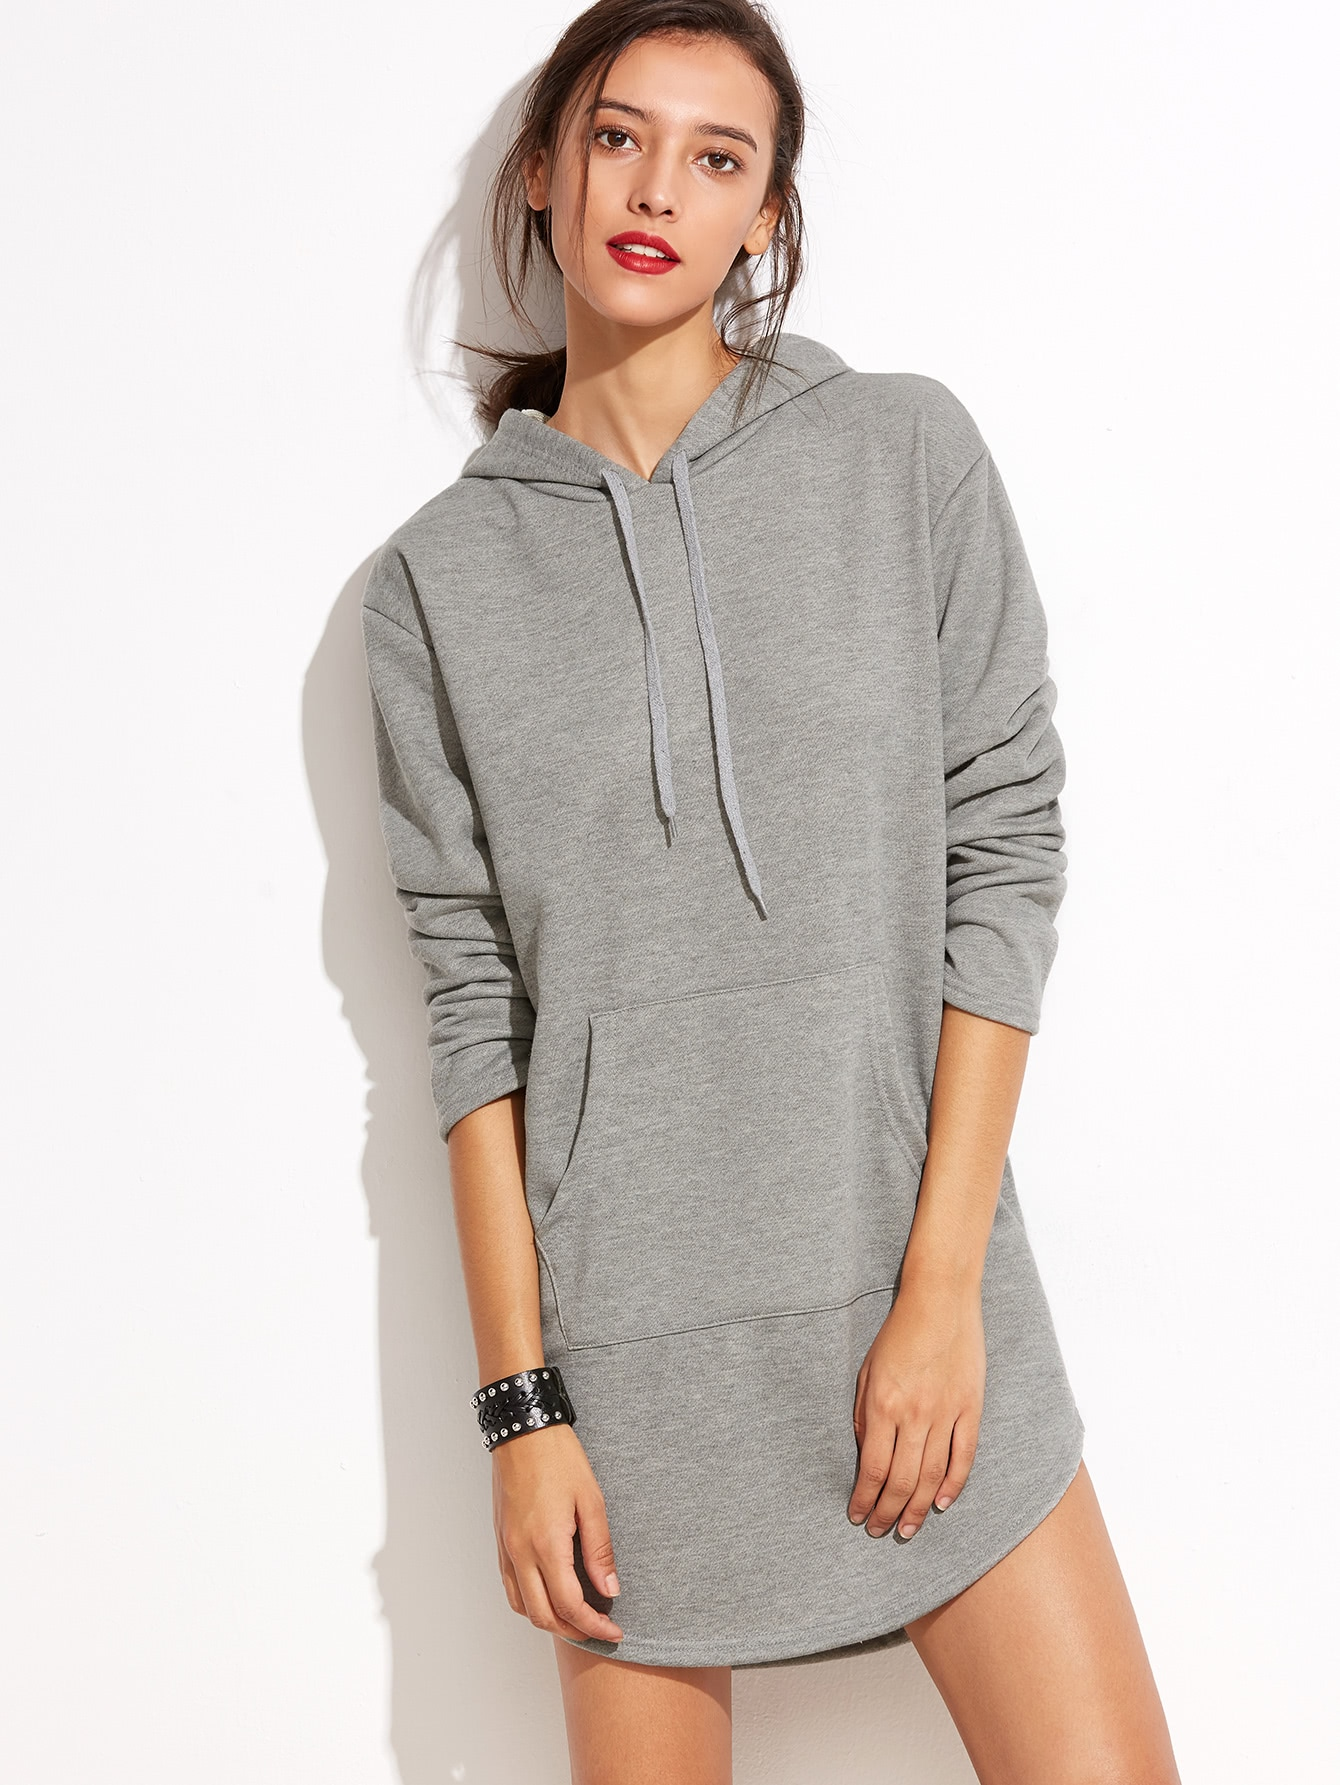 Grey Hooded Pocket Sweatshirt Dress